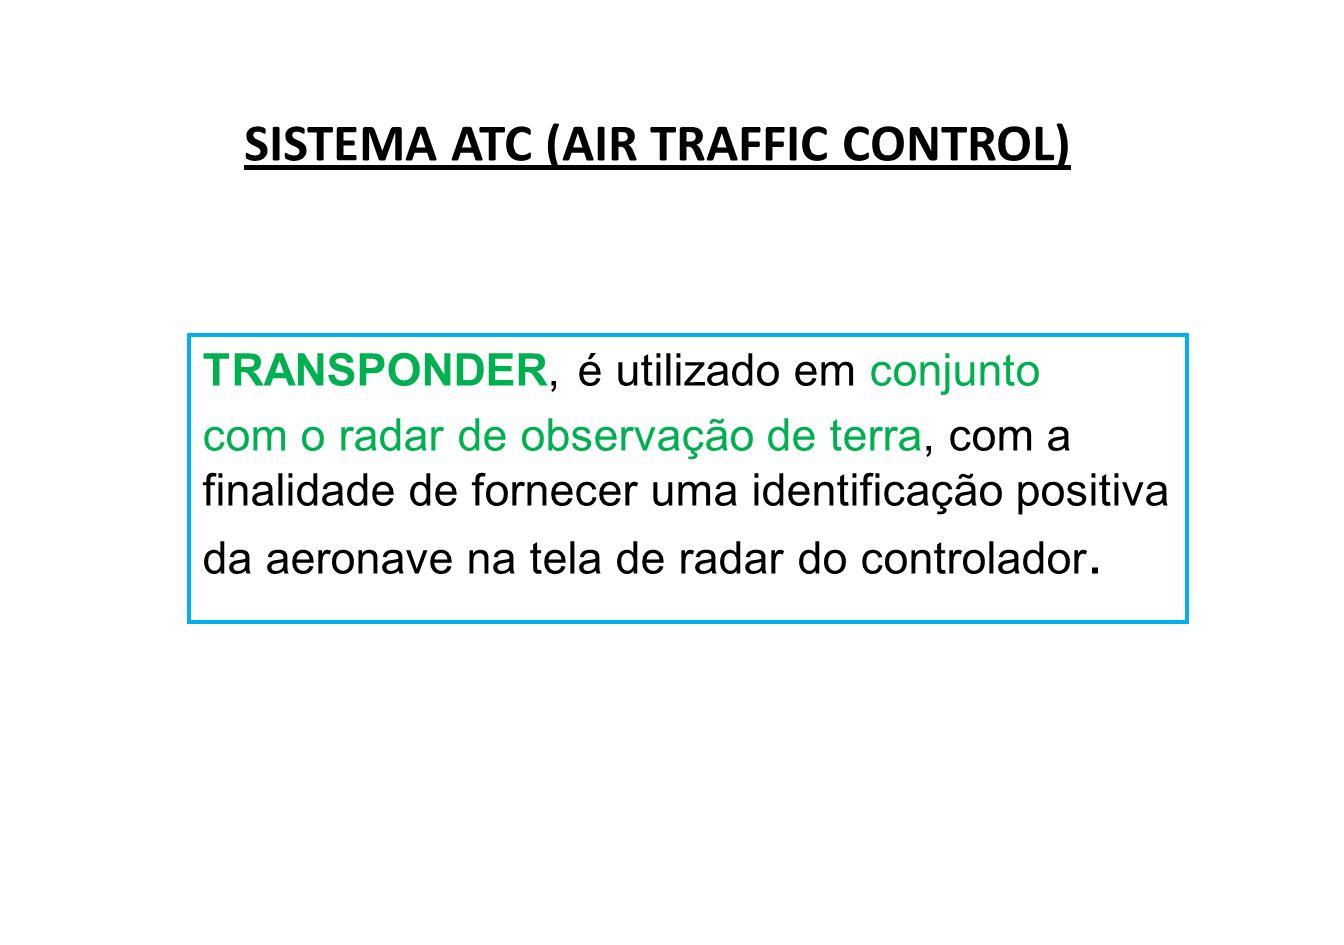 SISTEMA ATC (AIR TRAFFIC CONTROL)